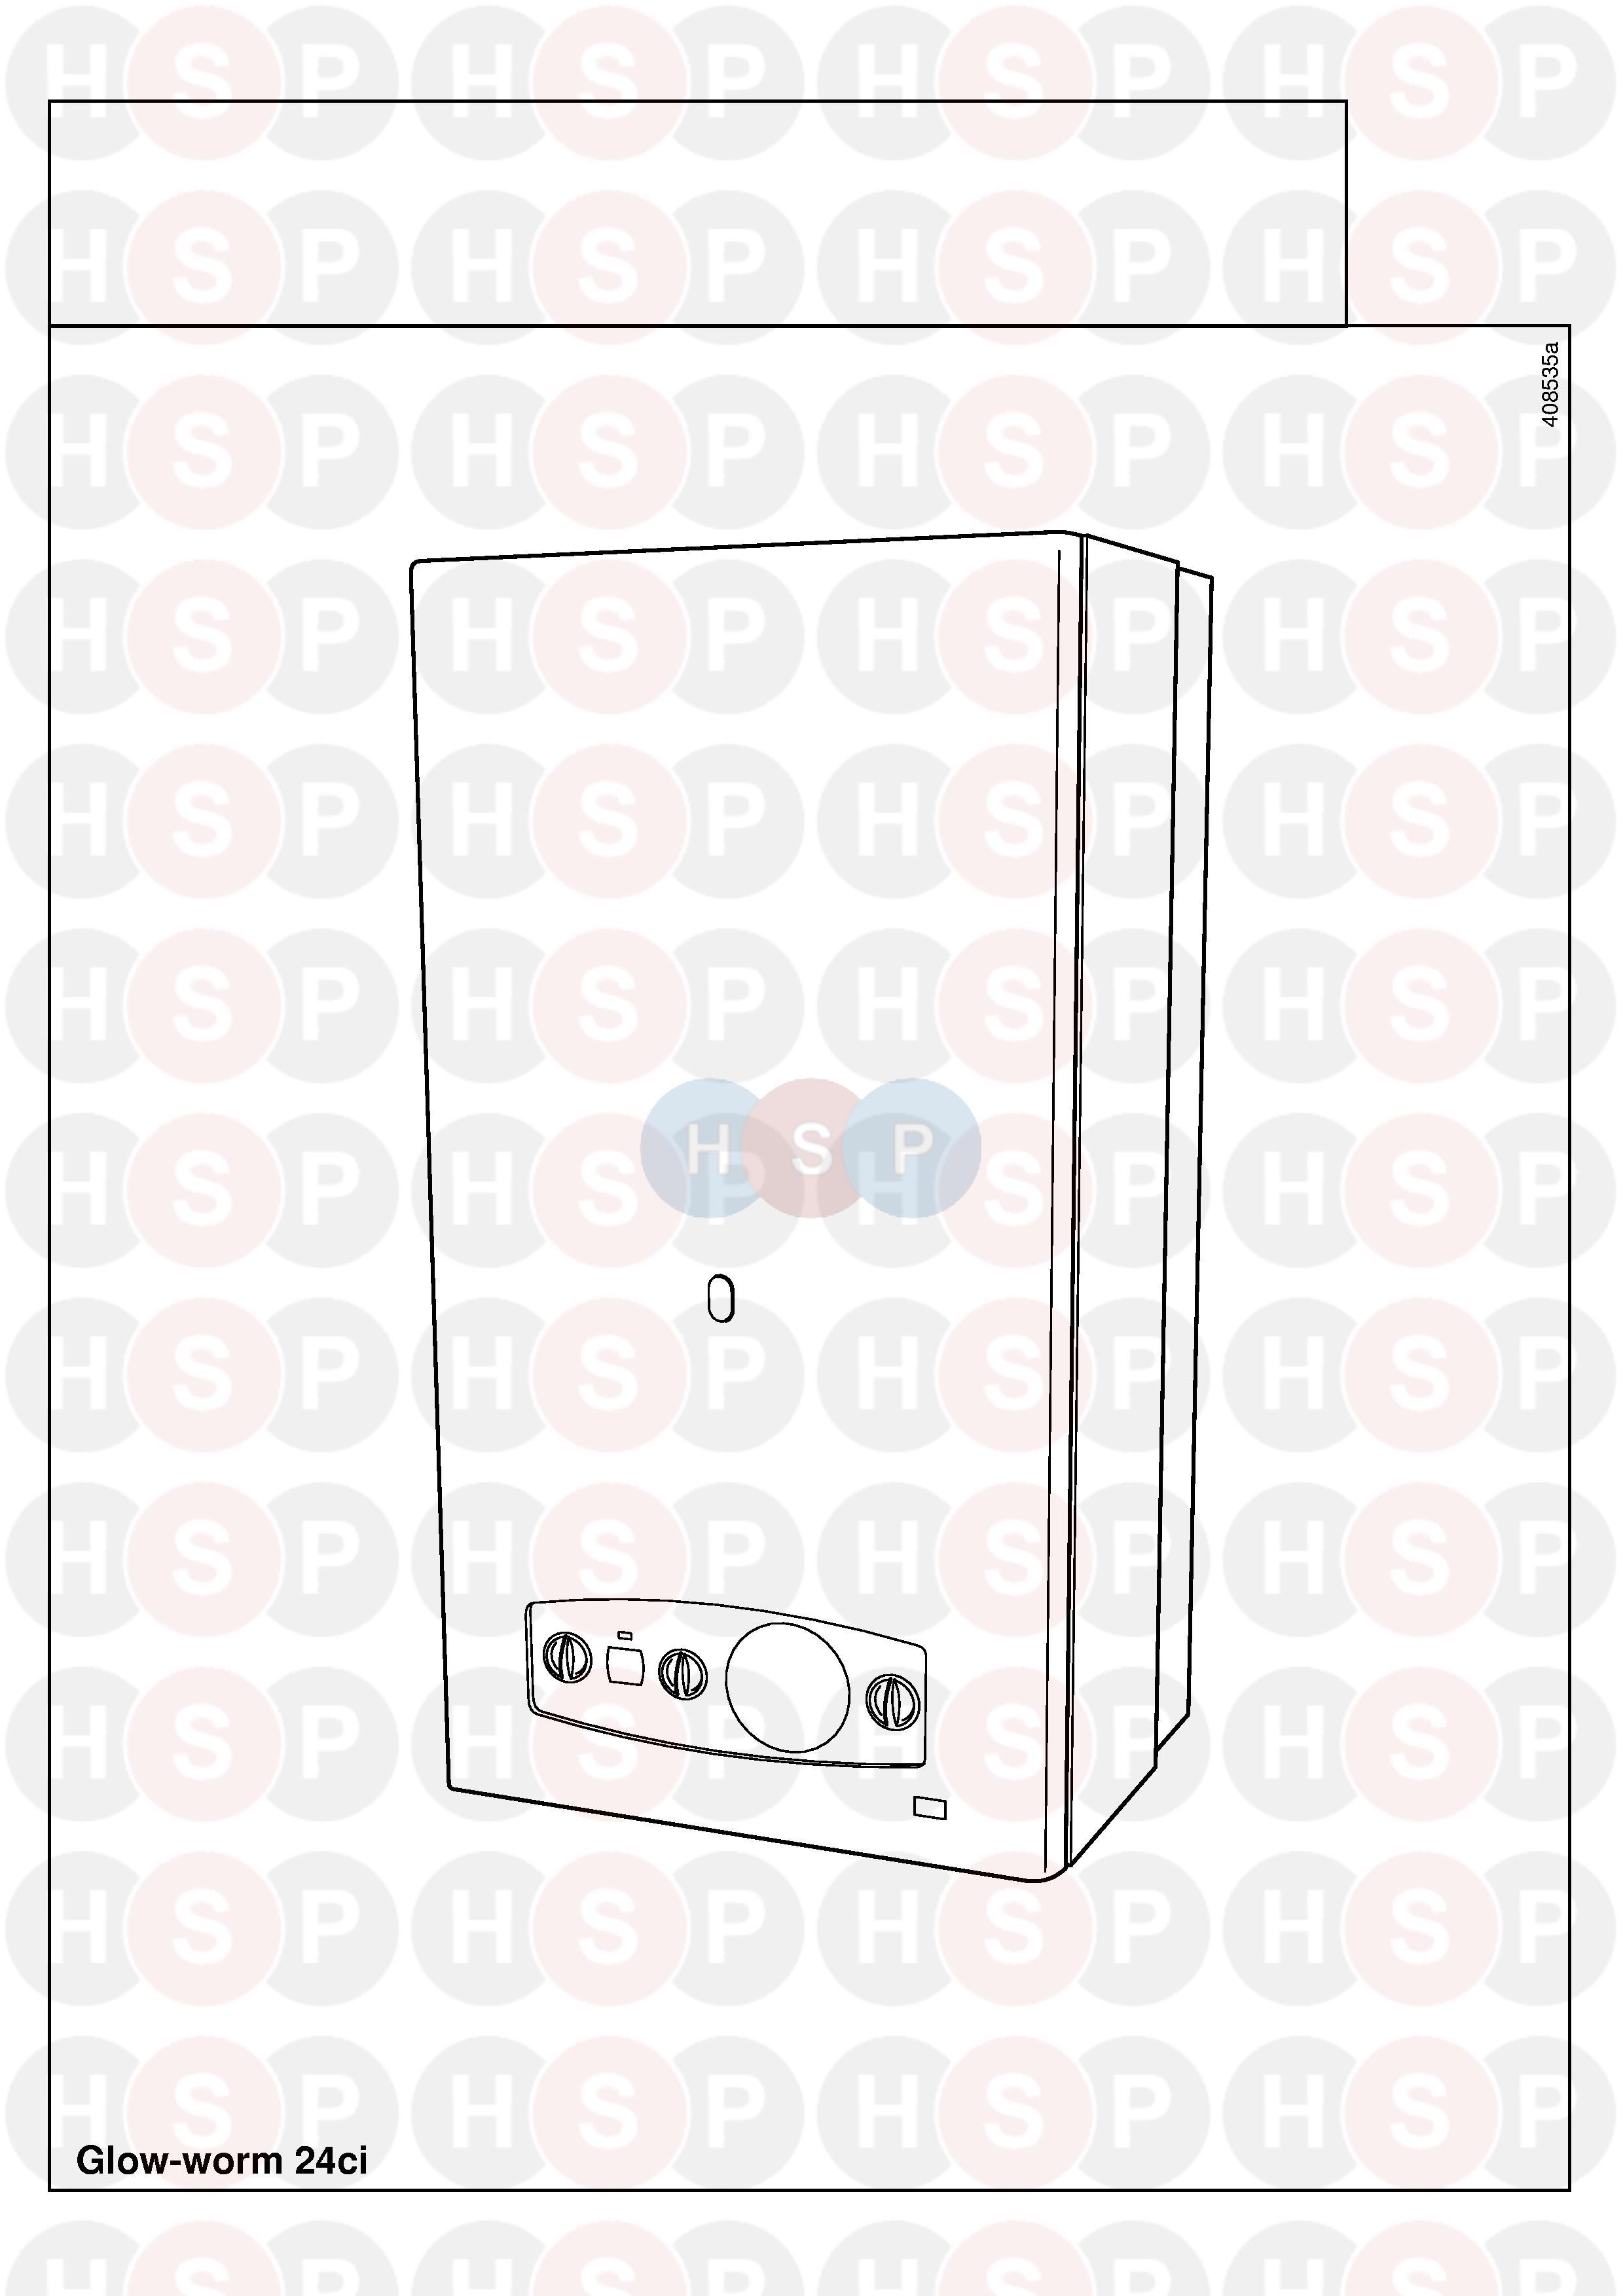 glowworm gw 24ci appliance diagram  appliance overview